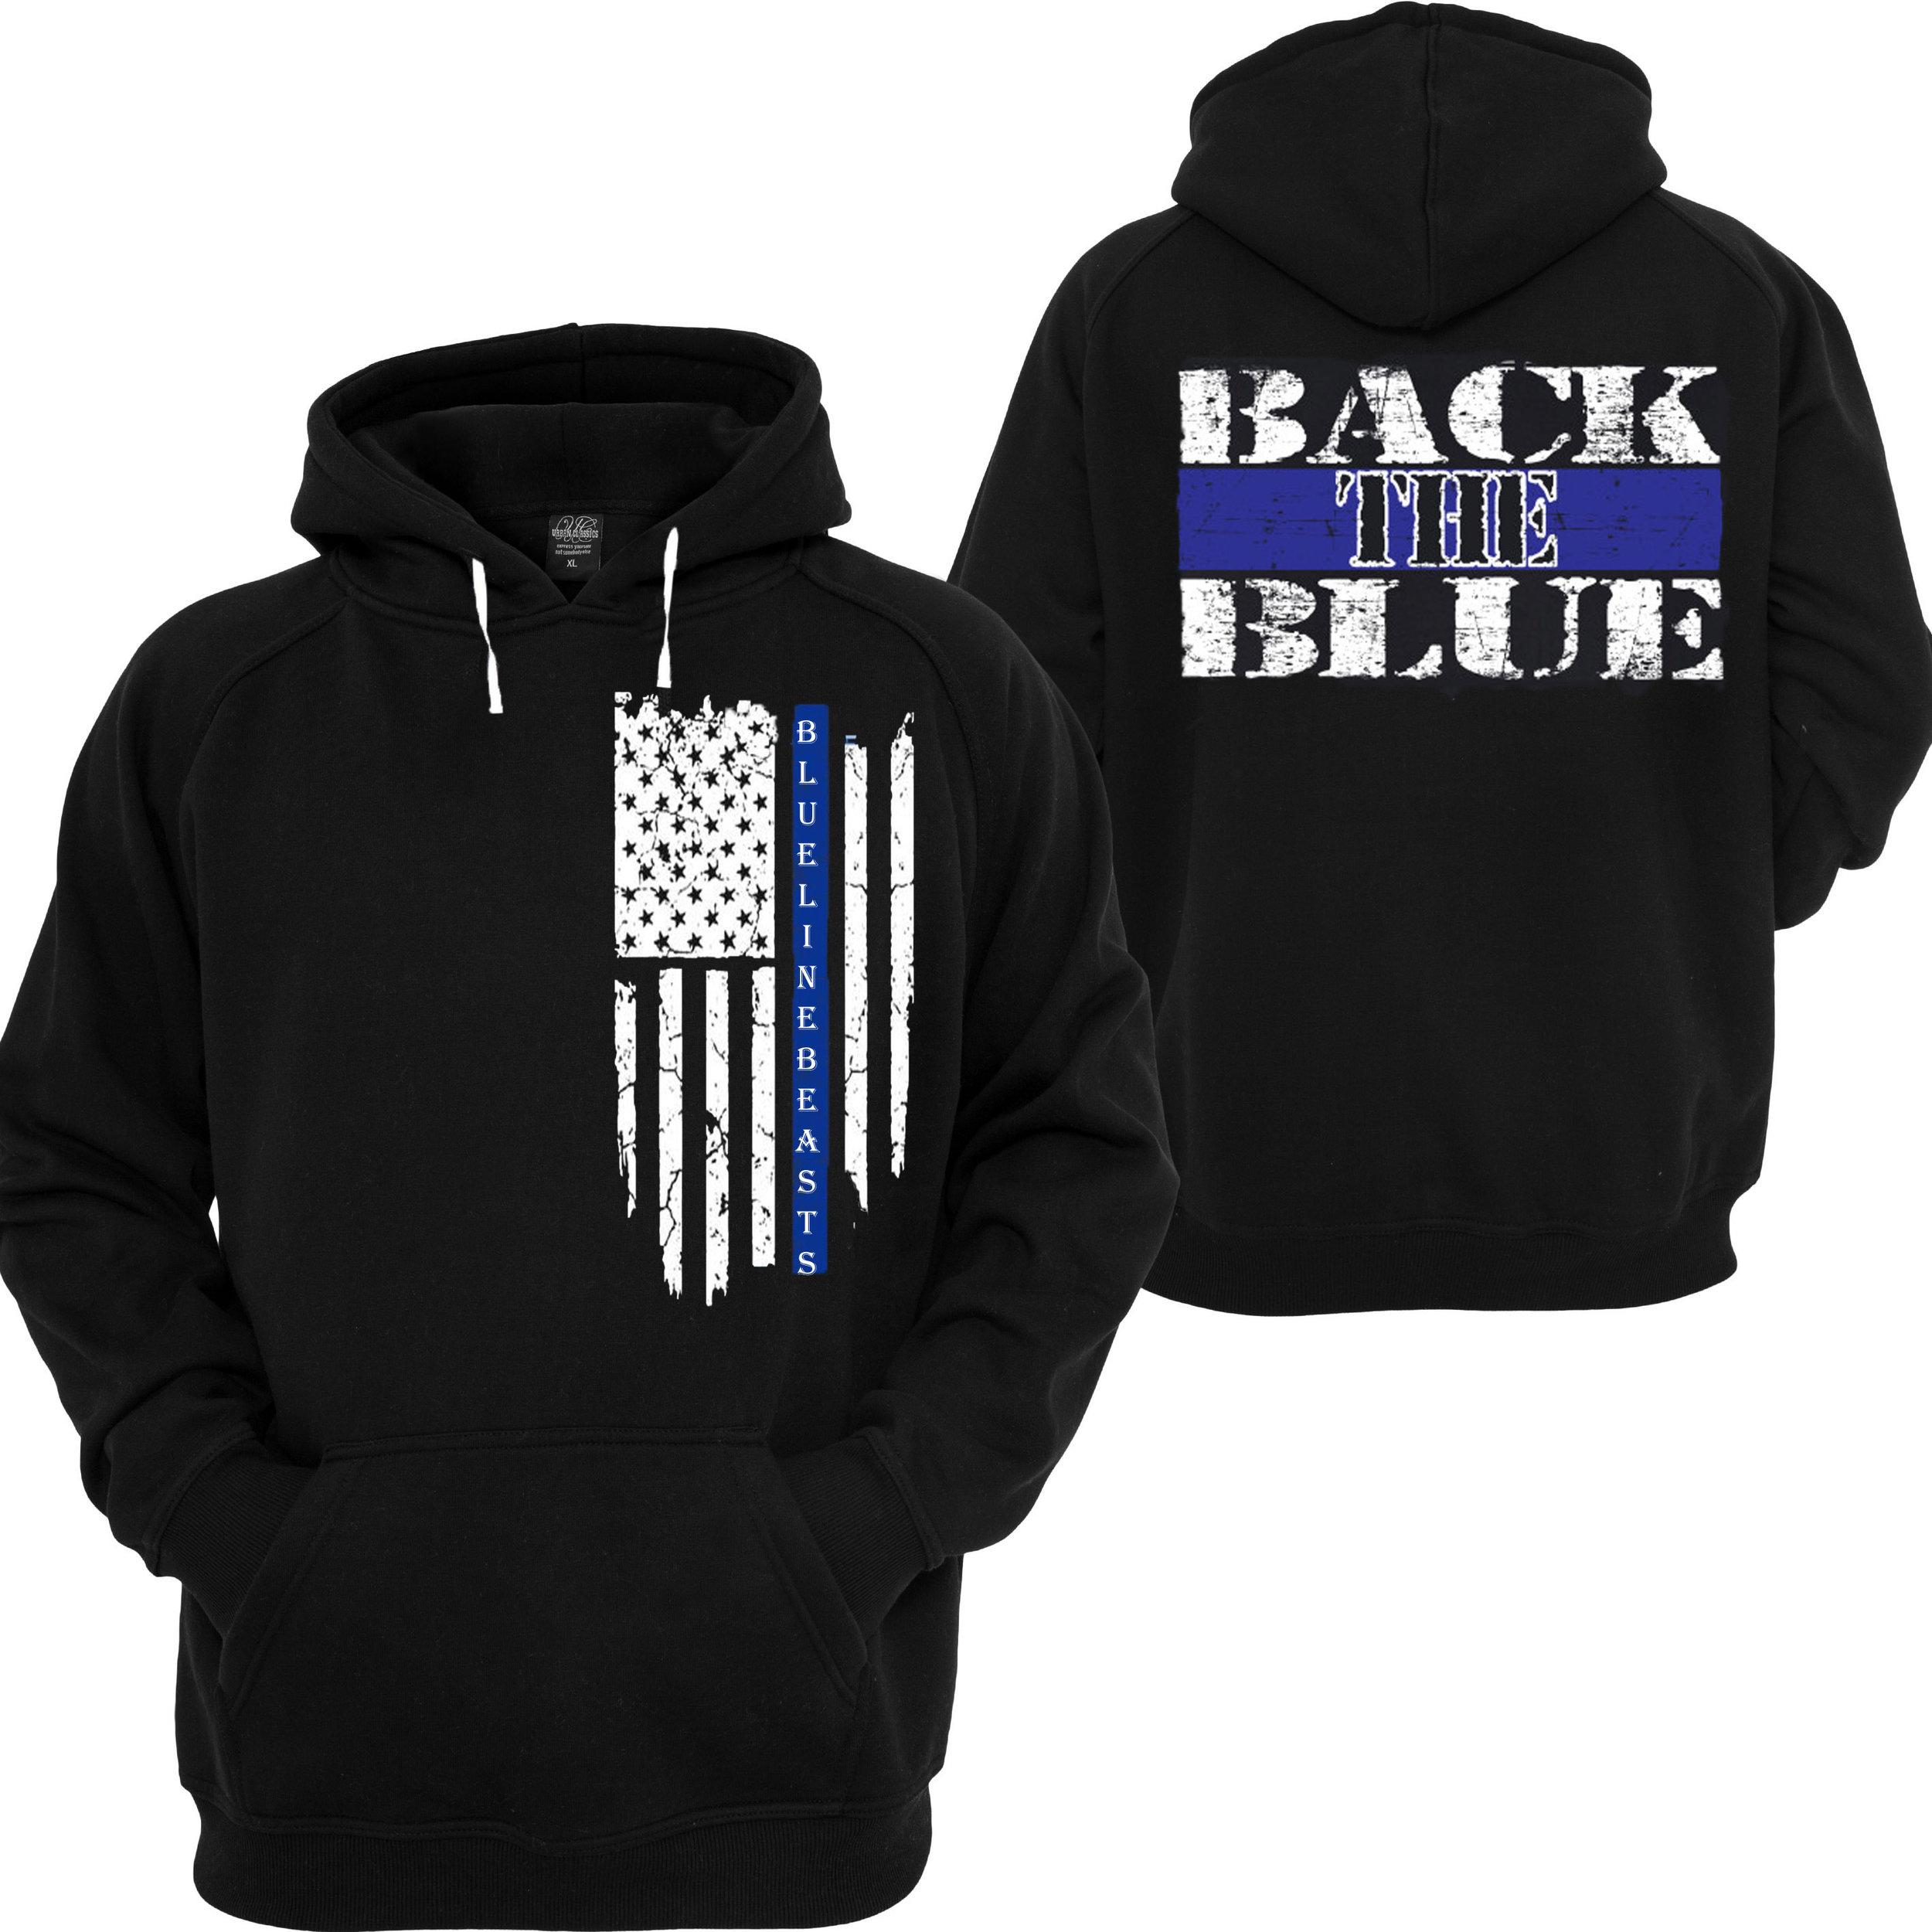 3a8a7562 Back the Blue (Hoodie Black) — Blue Line Beasts